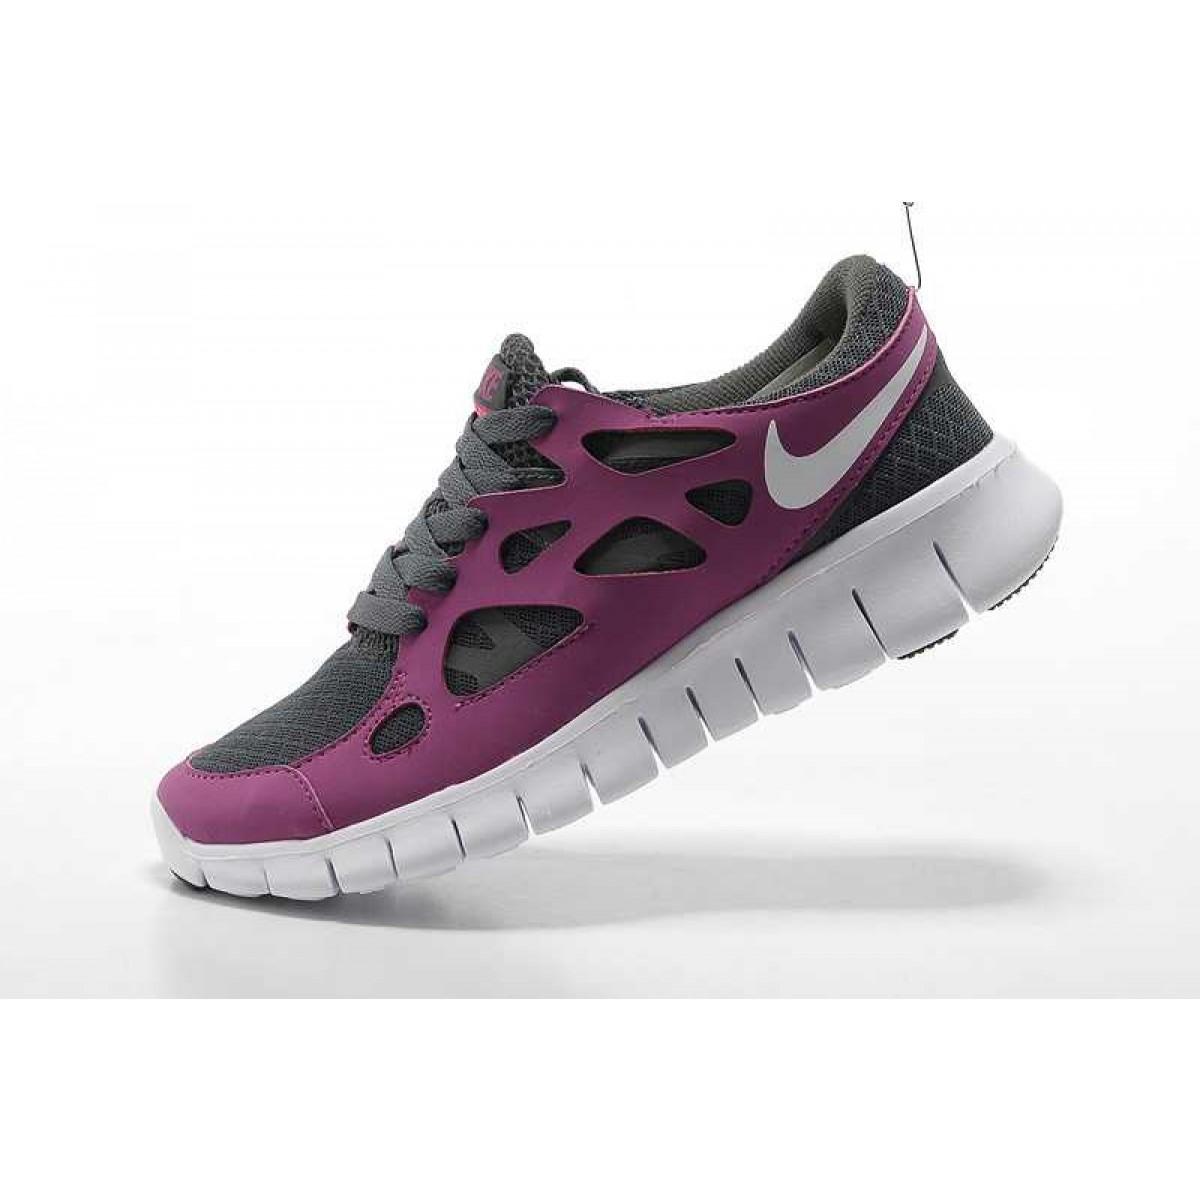 on sale accc8 d9044 Nike Free Run 2 Femme Chaussures Blanc Pourpre,nike free run 3,fashioniable,